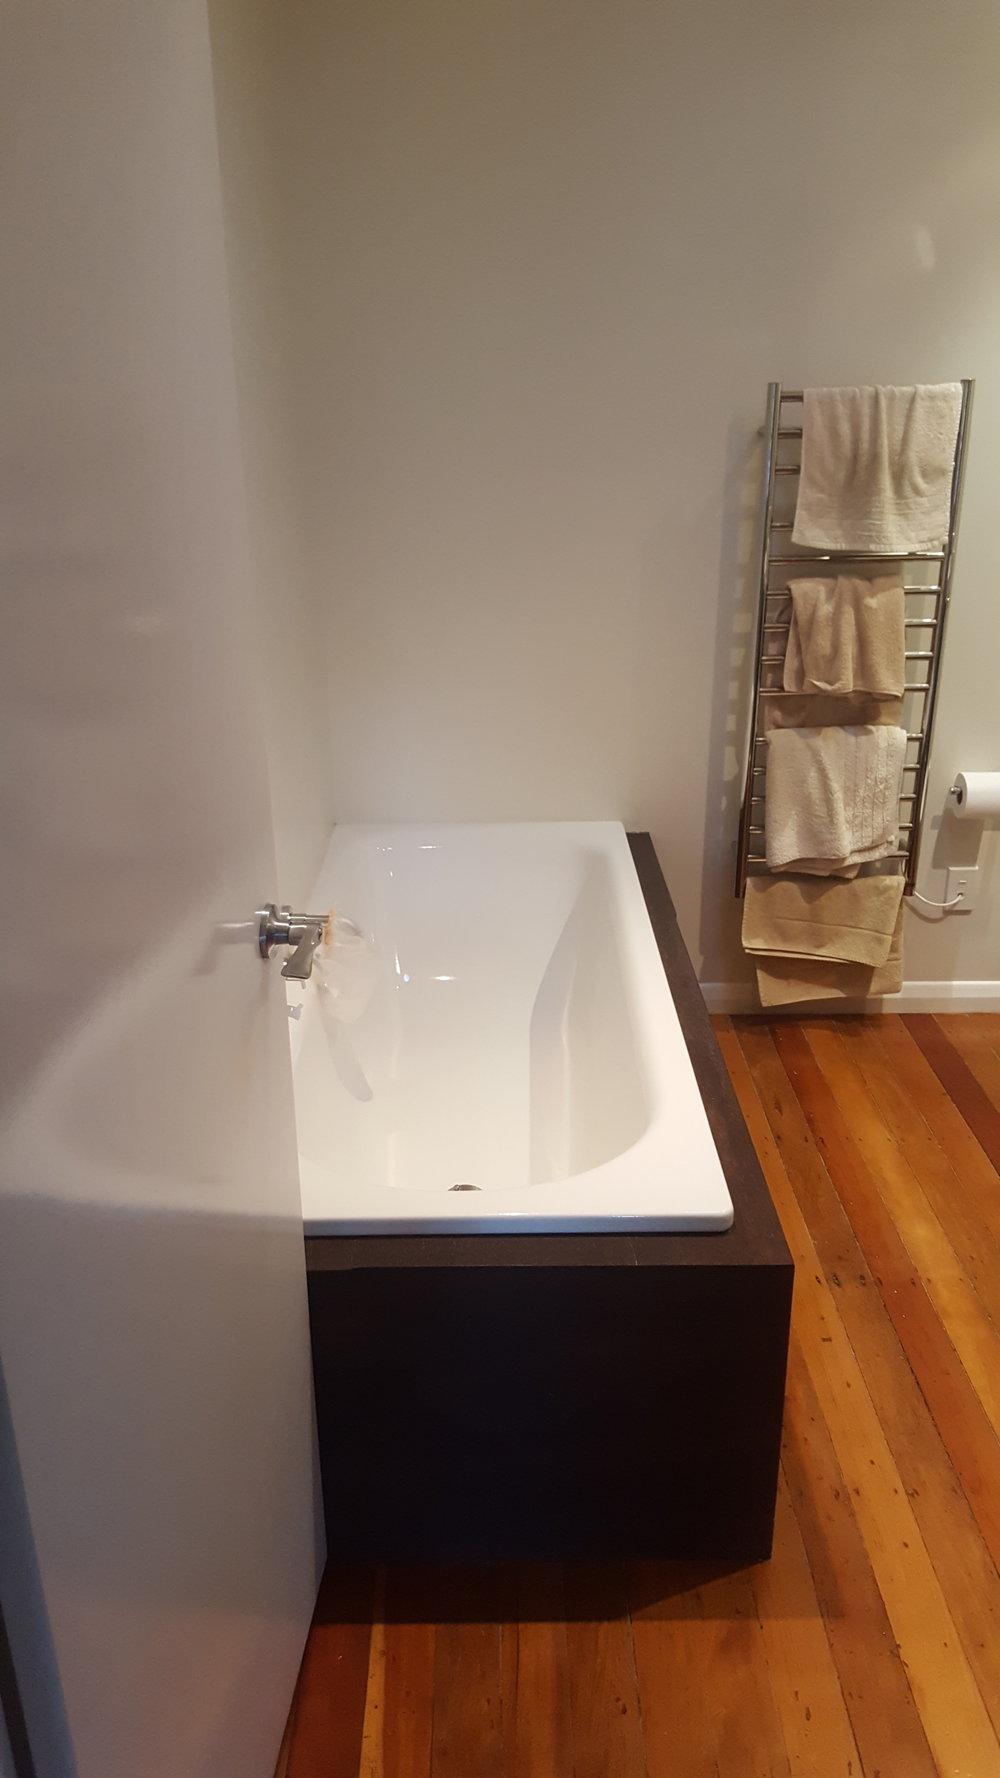 Bathroom renovation (Before photo)